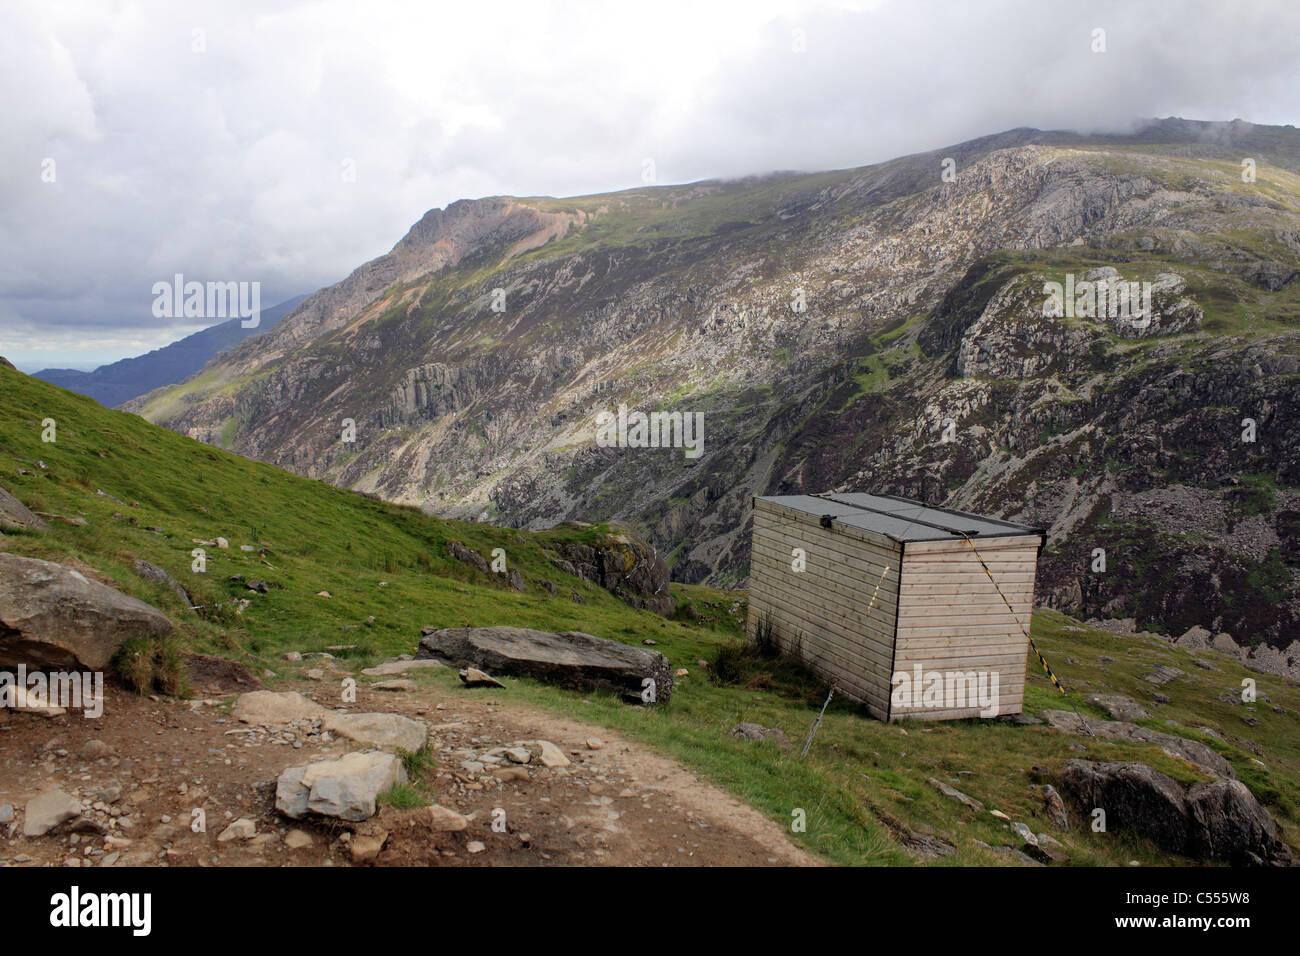 Snowdonia National Park Wales UK - Stock Image